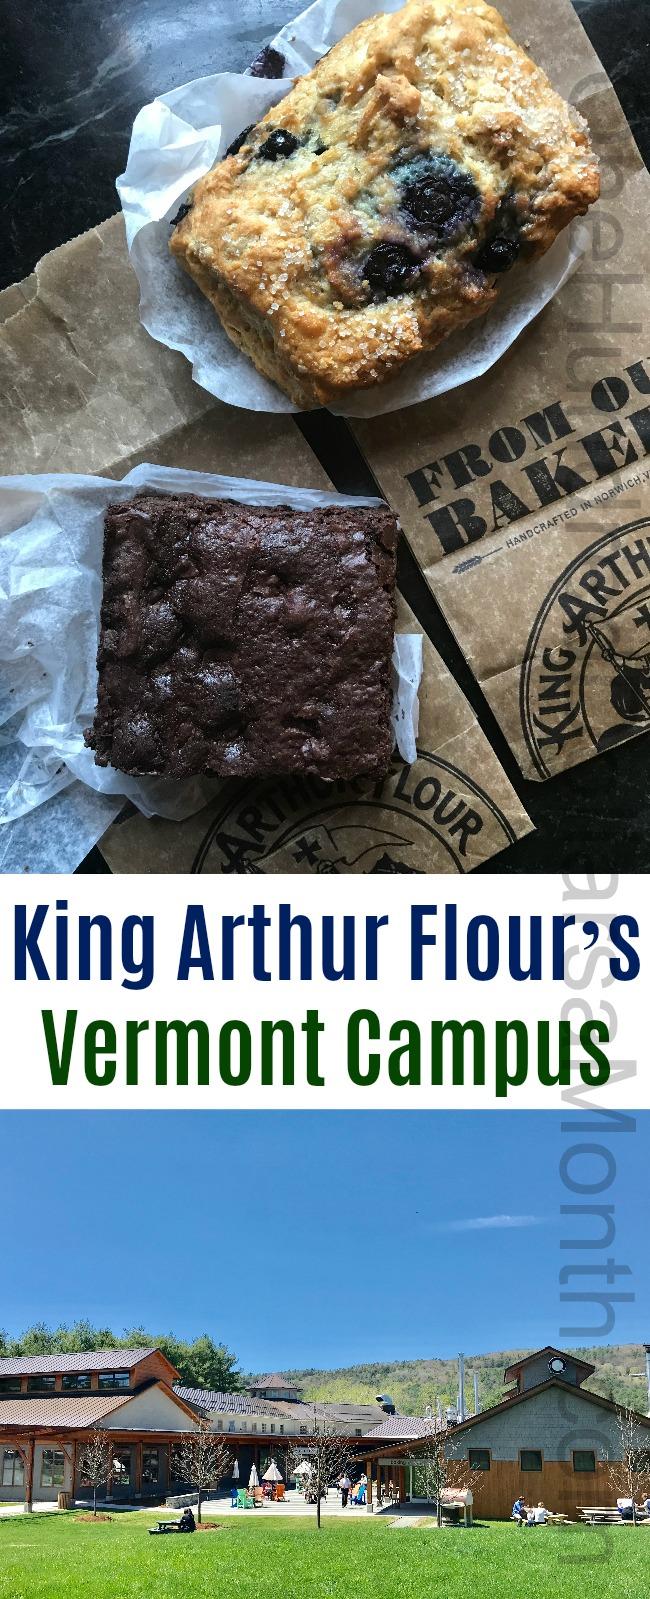 King Arthur Flour's Vermont Campus in Norwich, Vermont